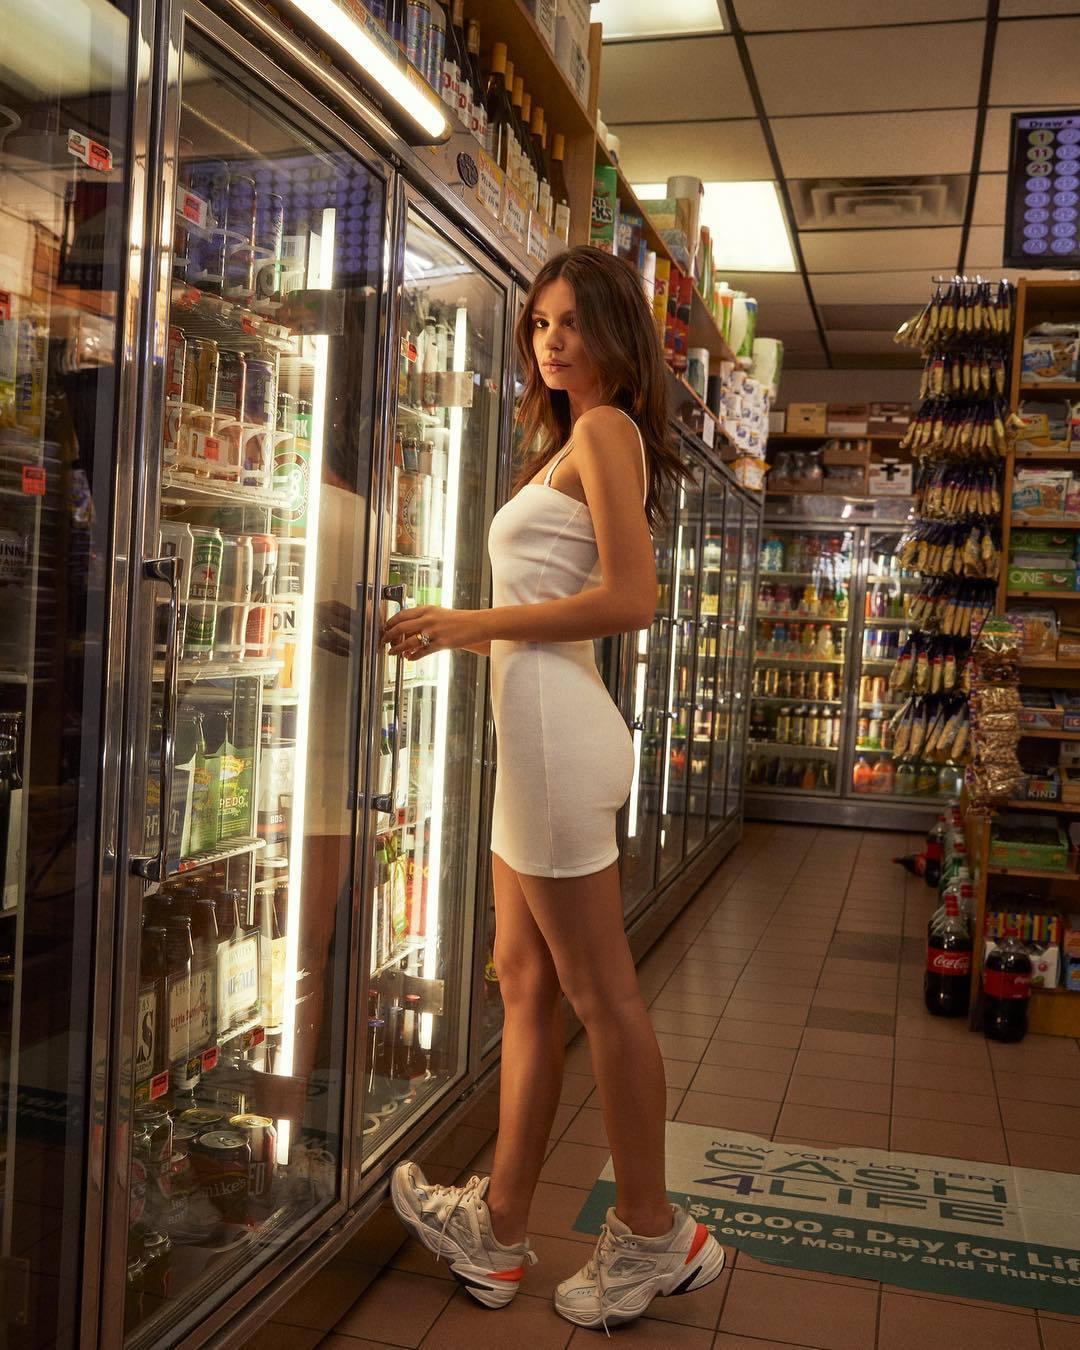 dress white white dress sneakers bodycon dress emily ratajkowski celebrity model summer dress